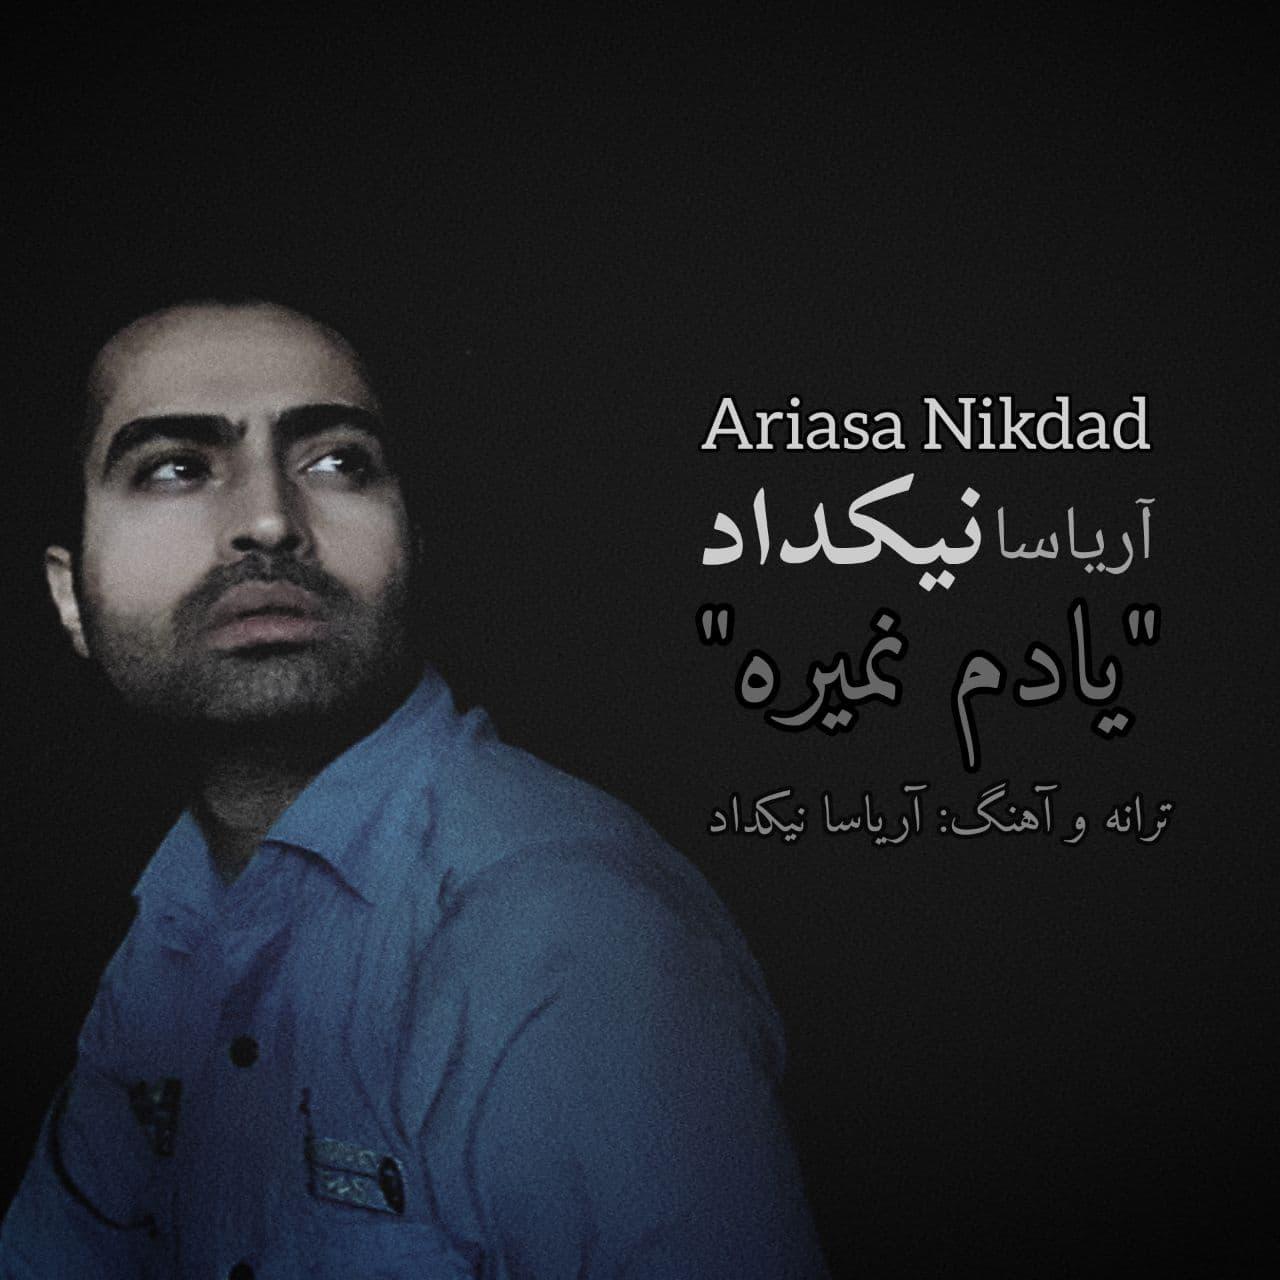 Ariasa Nikdad – Yadam Nemire